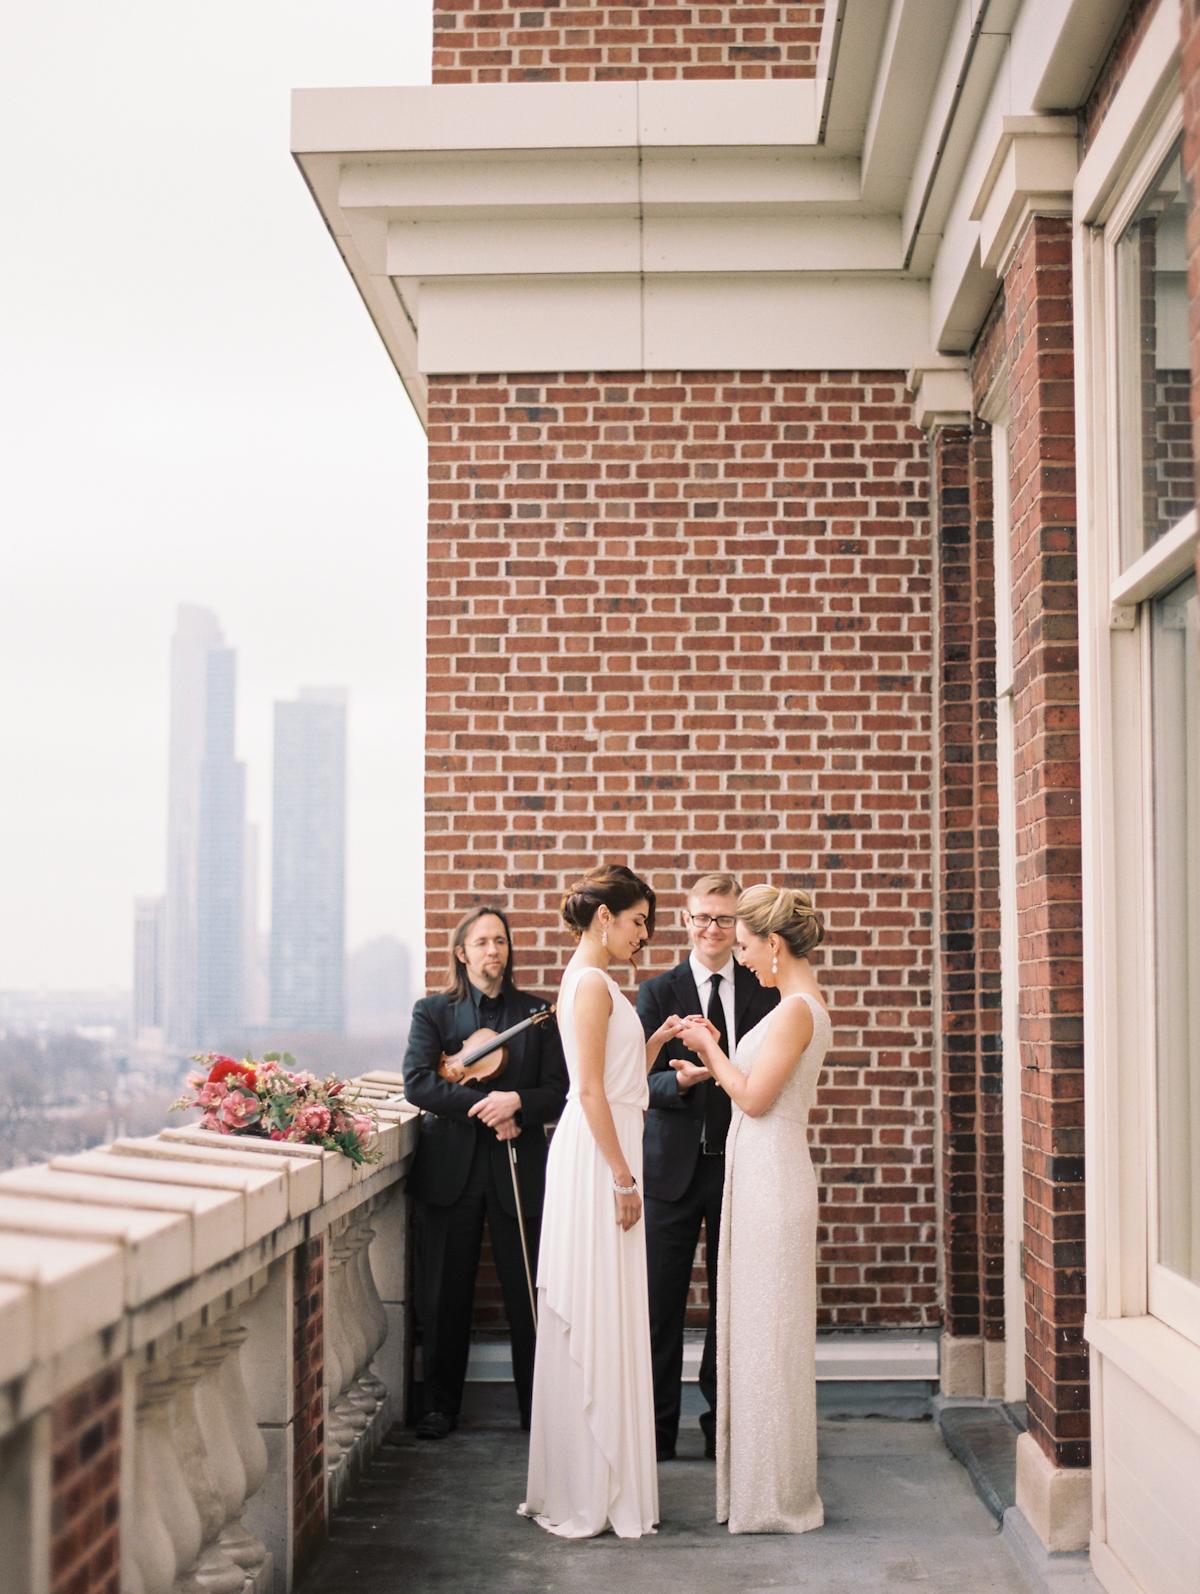 Clover Events | Intimate Elopement | Photos by Kristin La Voie Photography